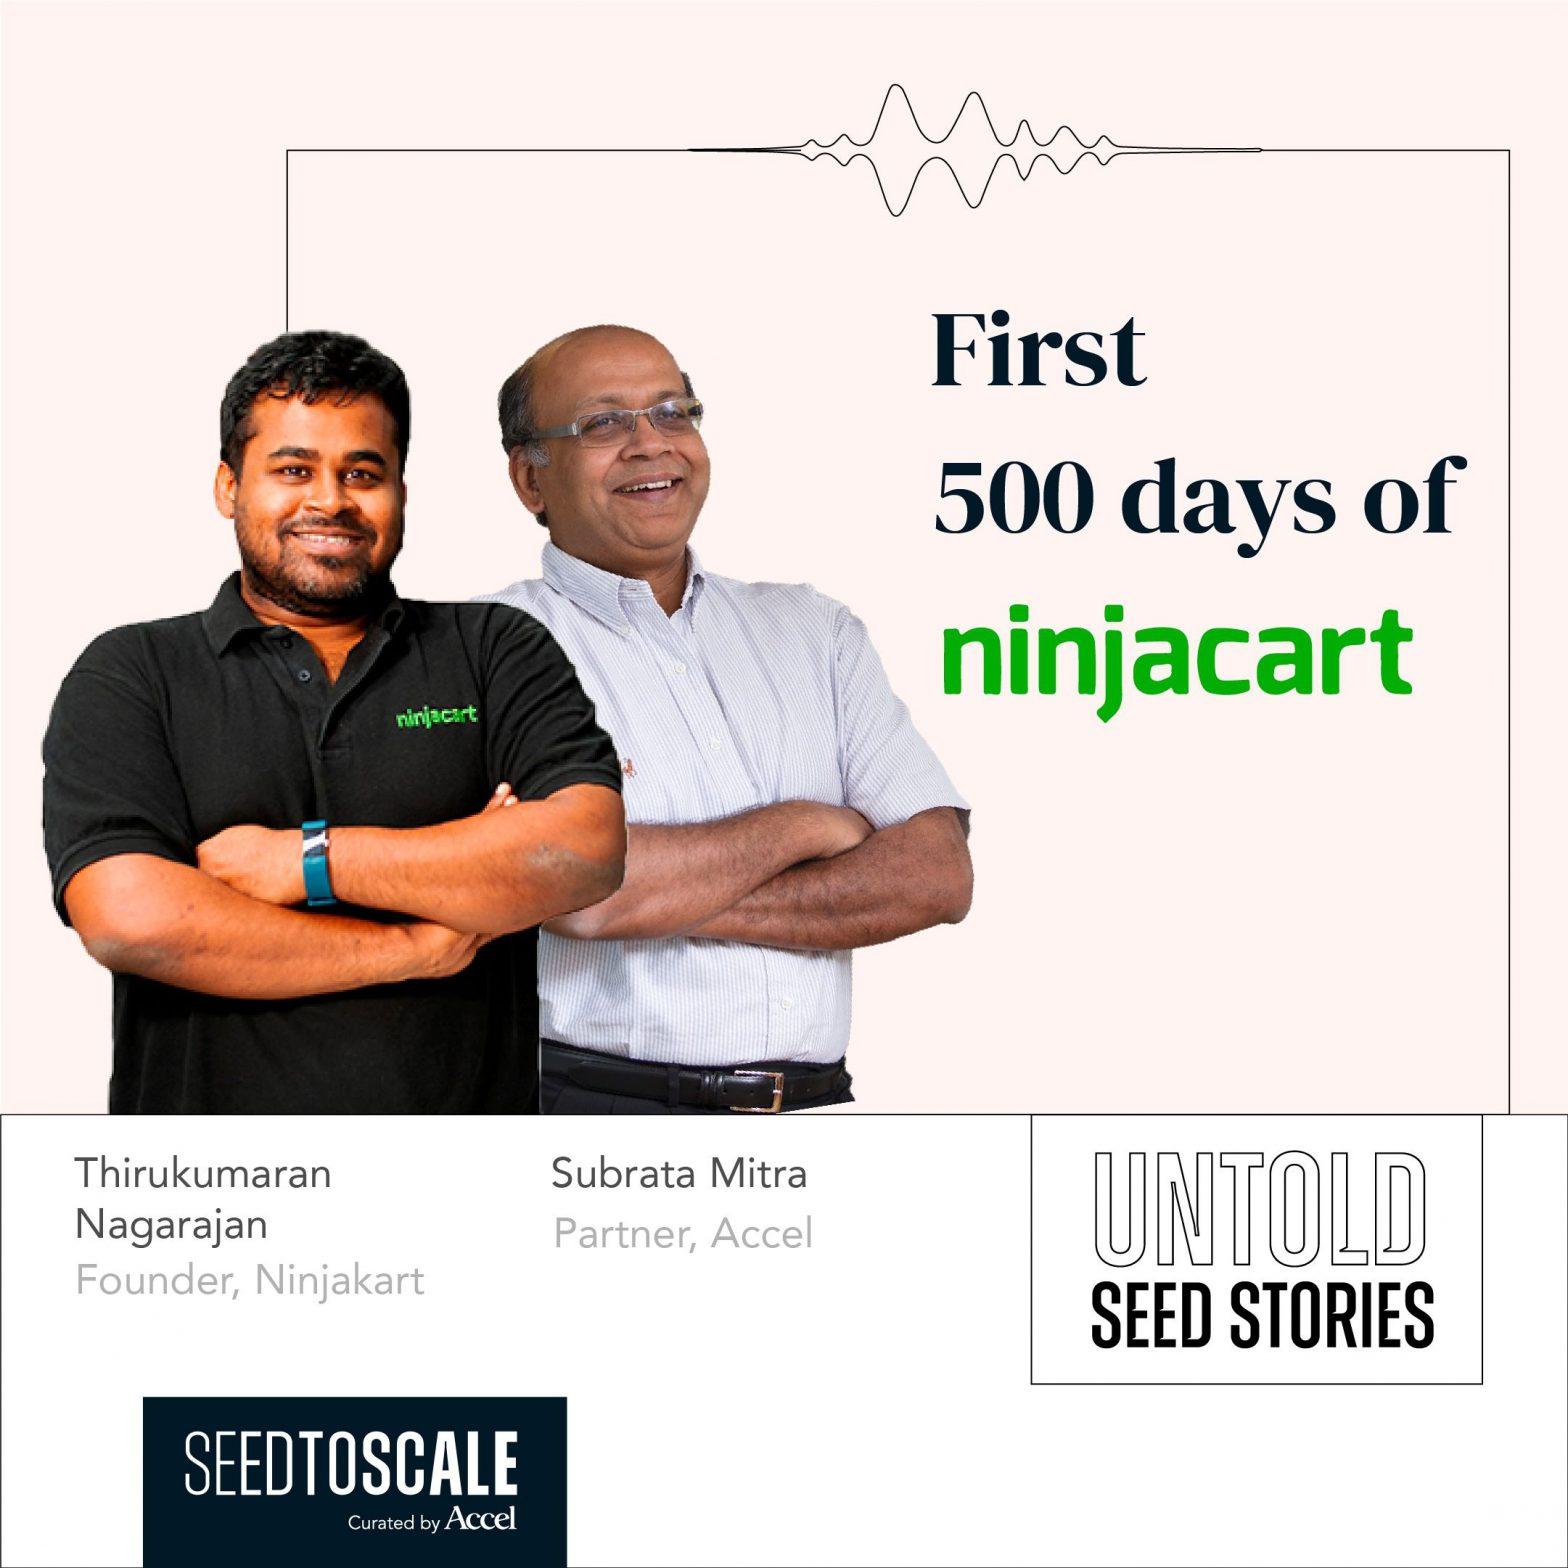 INSIGHTS #57 – Untold Seed Stories: First 500 Days of Ninjacart with Thirukumaran